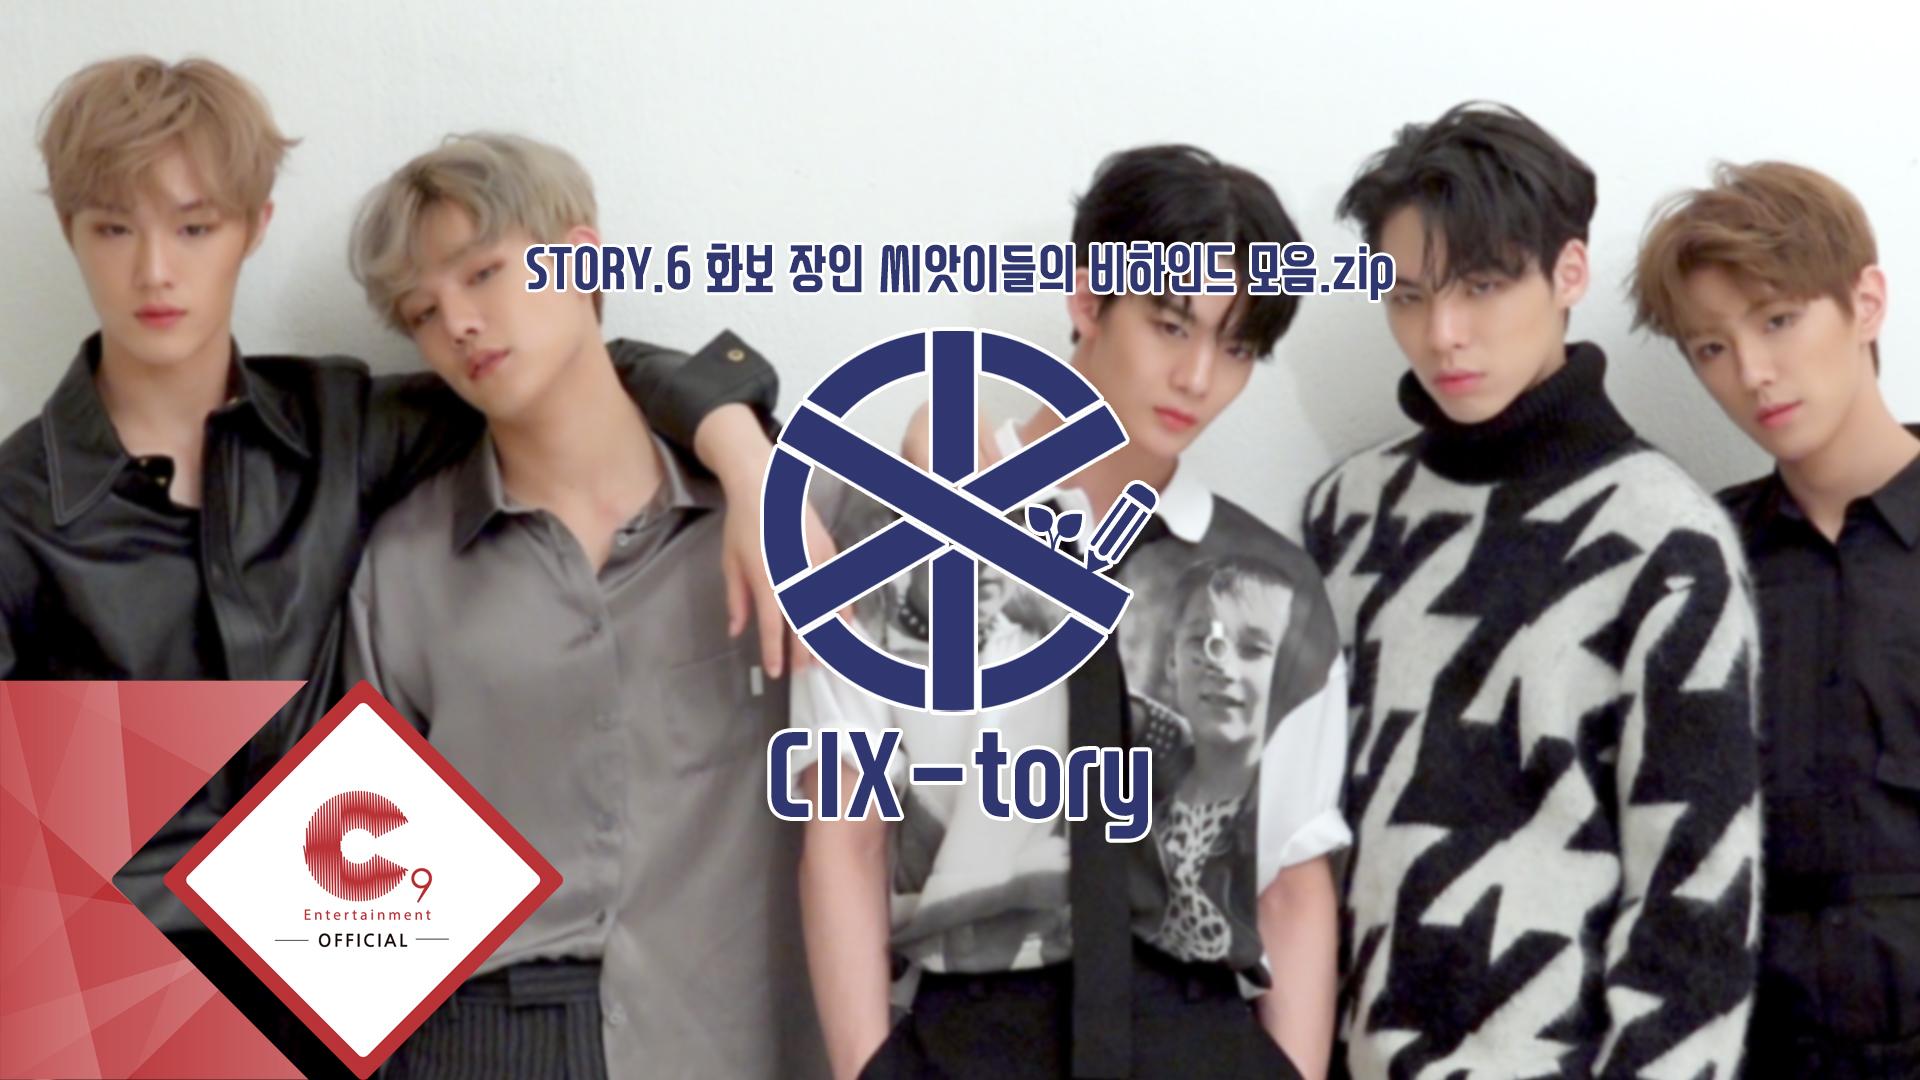 [CIX-tory] STORY.6 화보 장인 씨앗이들의 비하인드 모음.zip